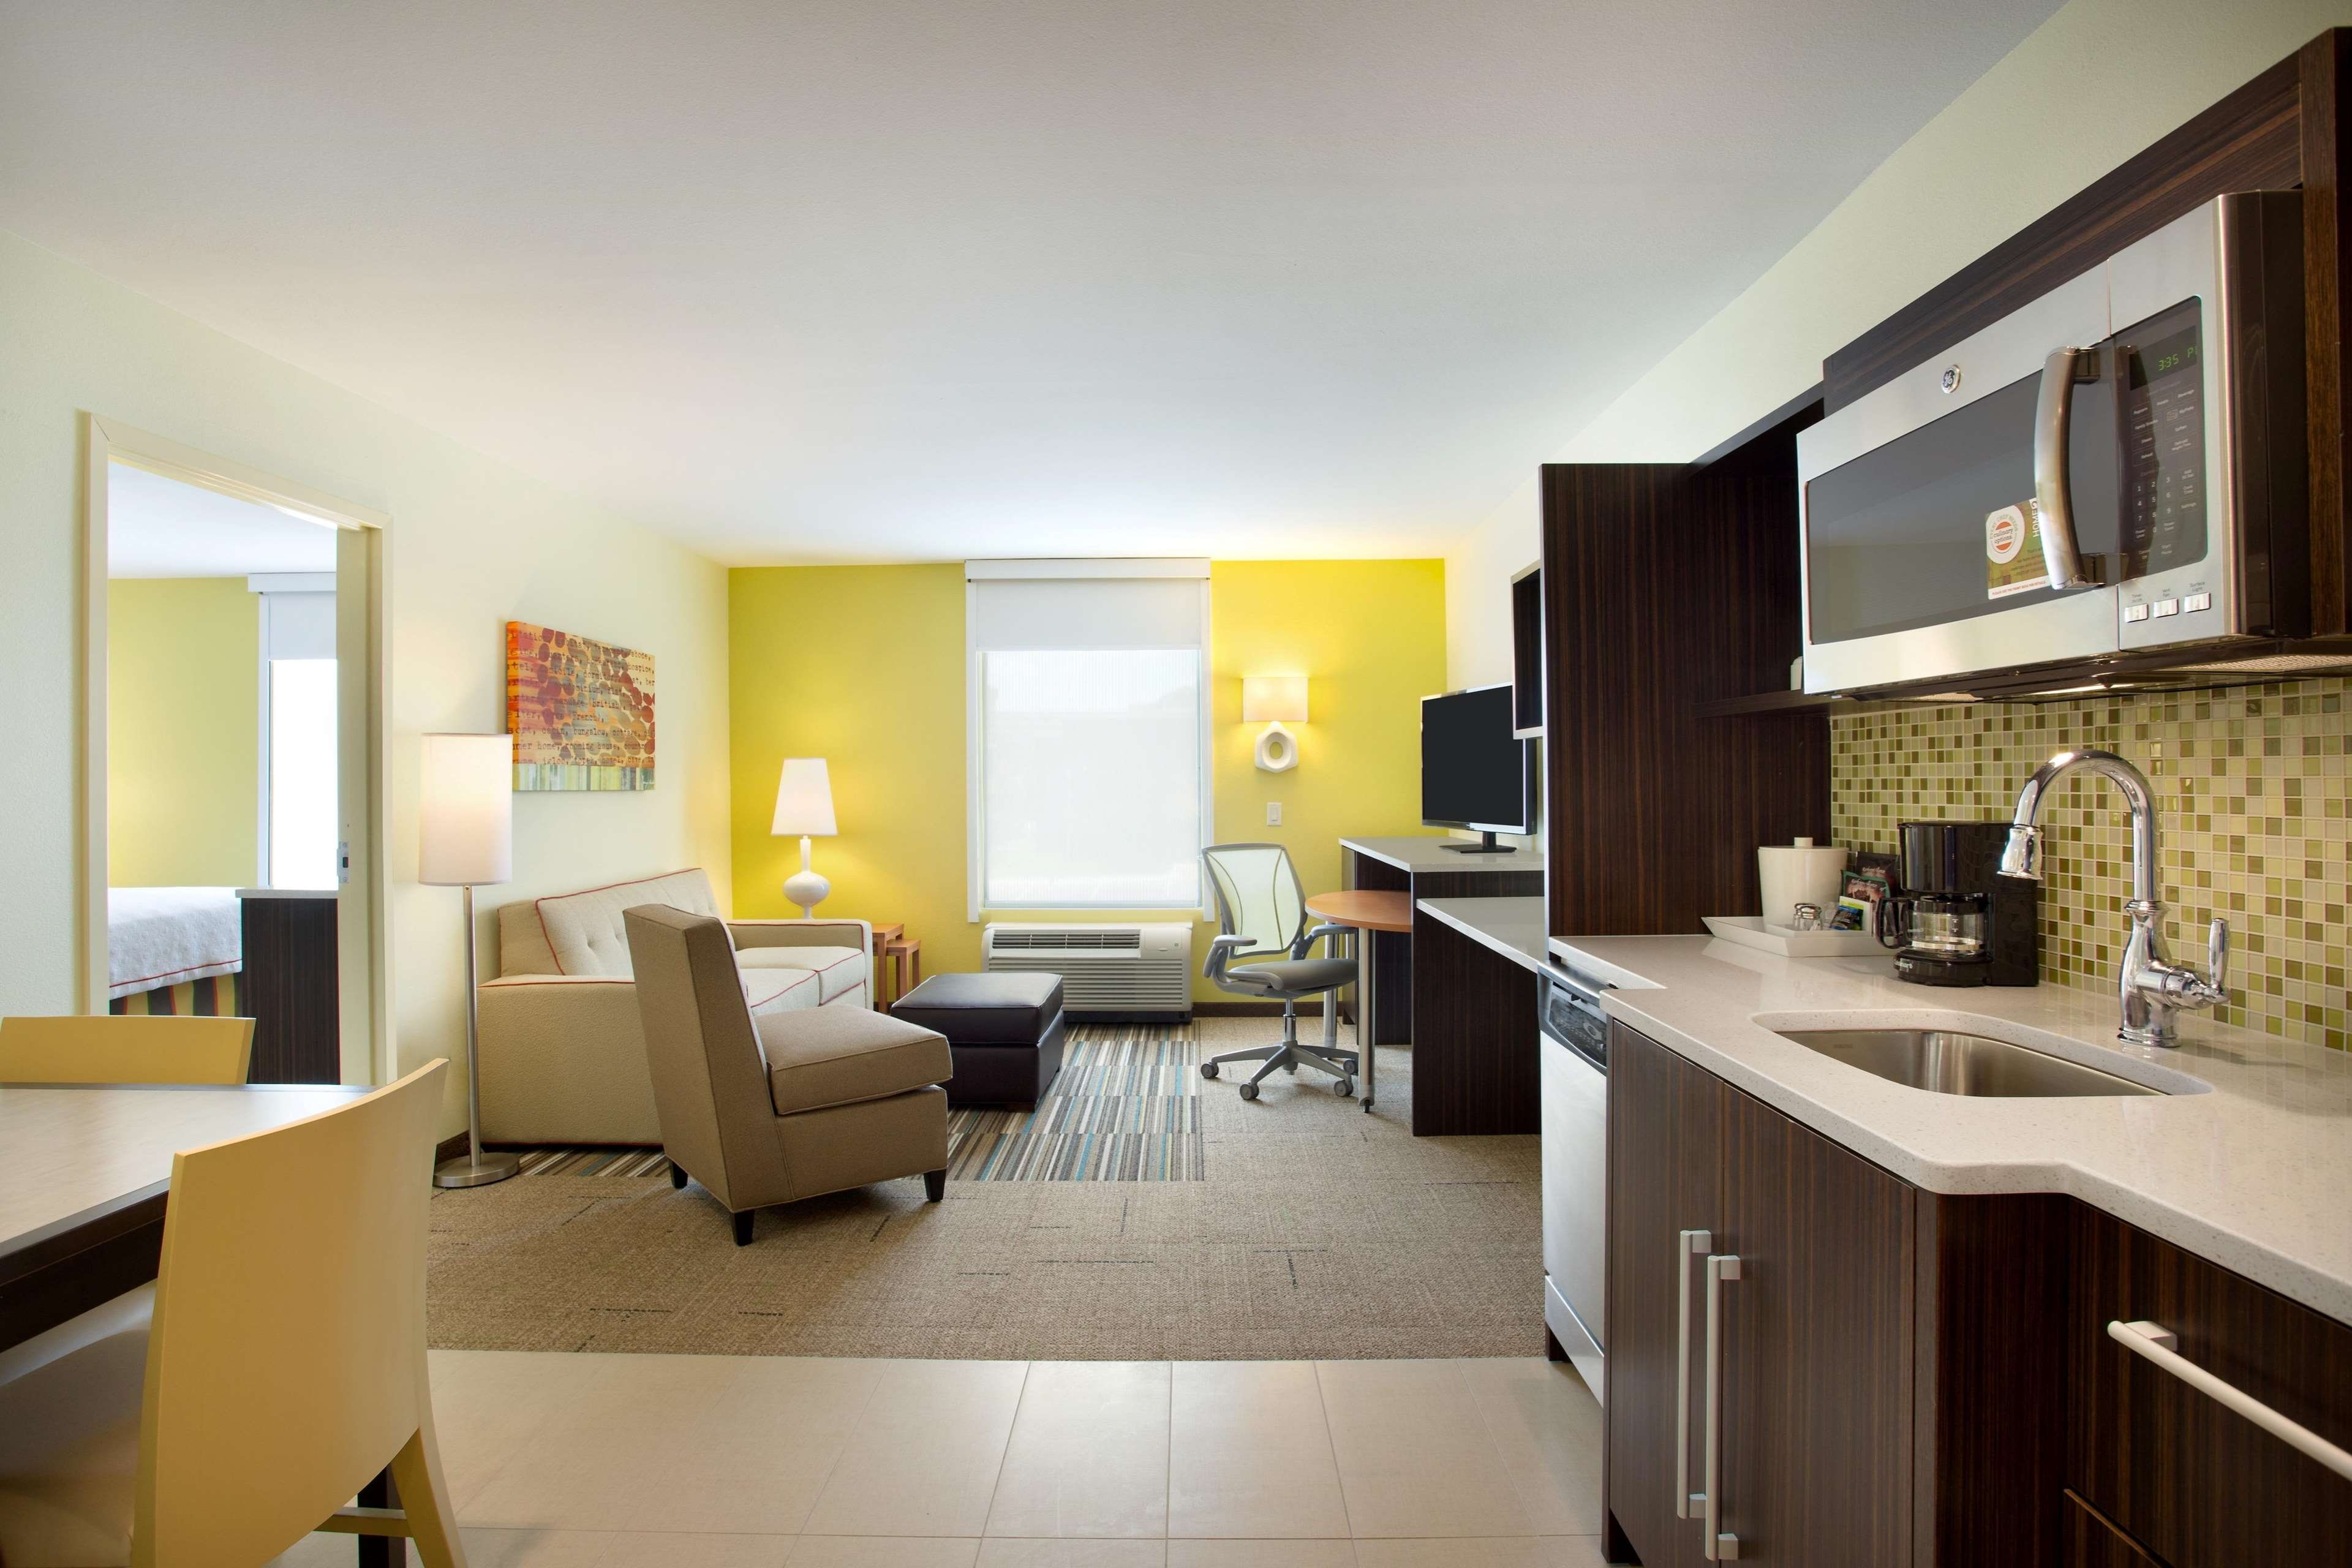 Home2 Suites by Hilton San Antonio Airport, TX image 22